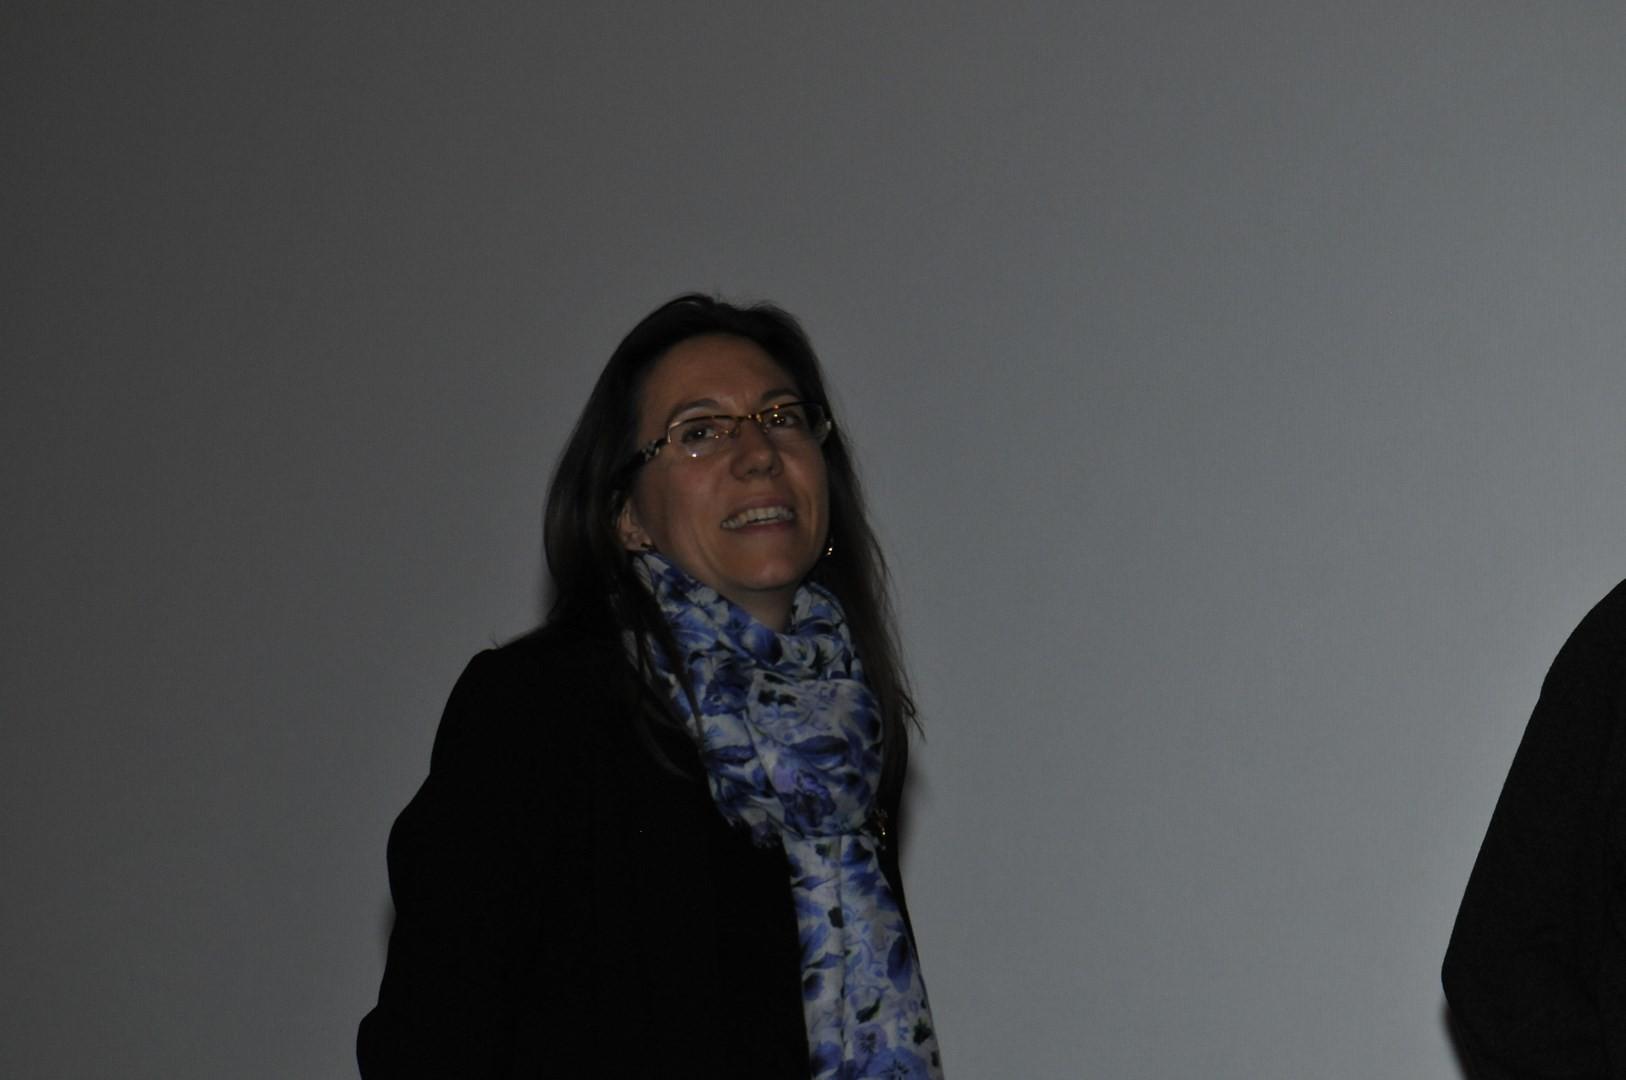 Rachel Visse